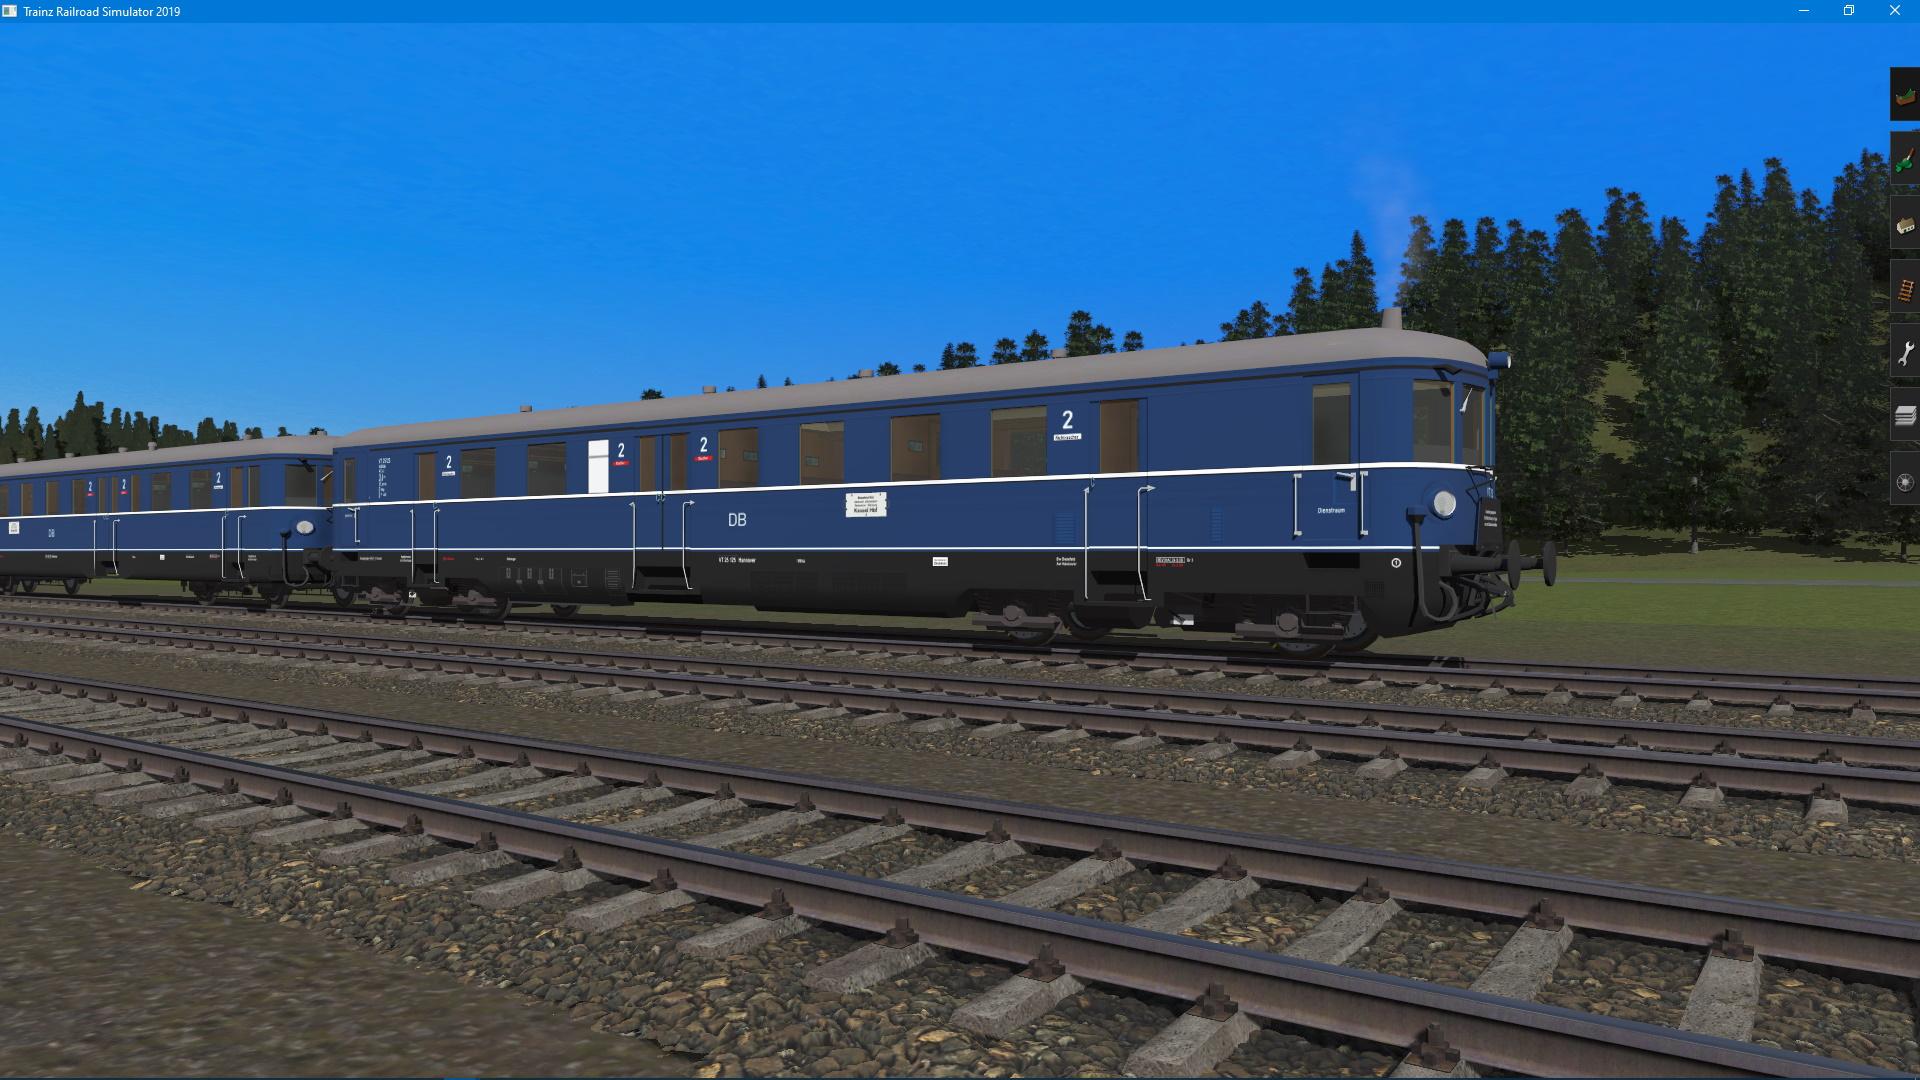 VT 25 125